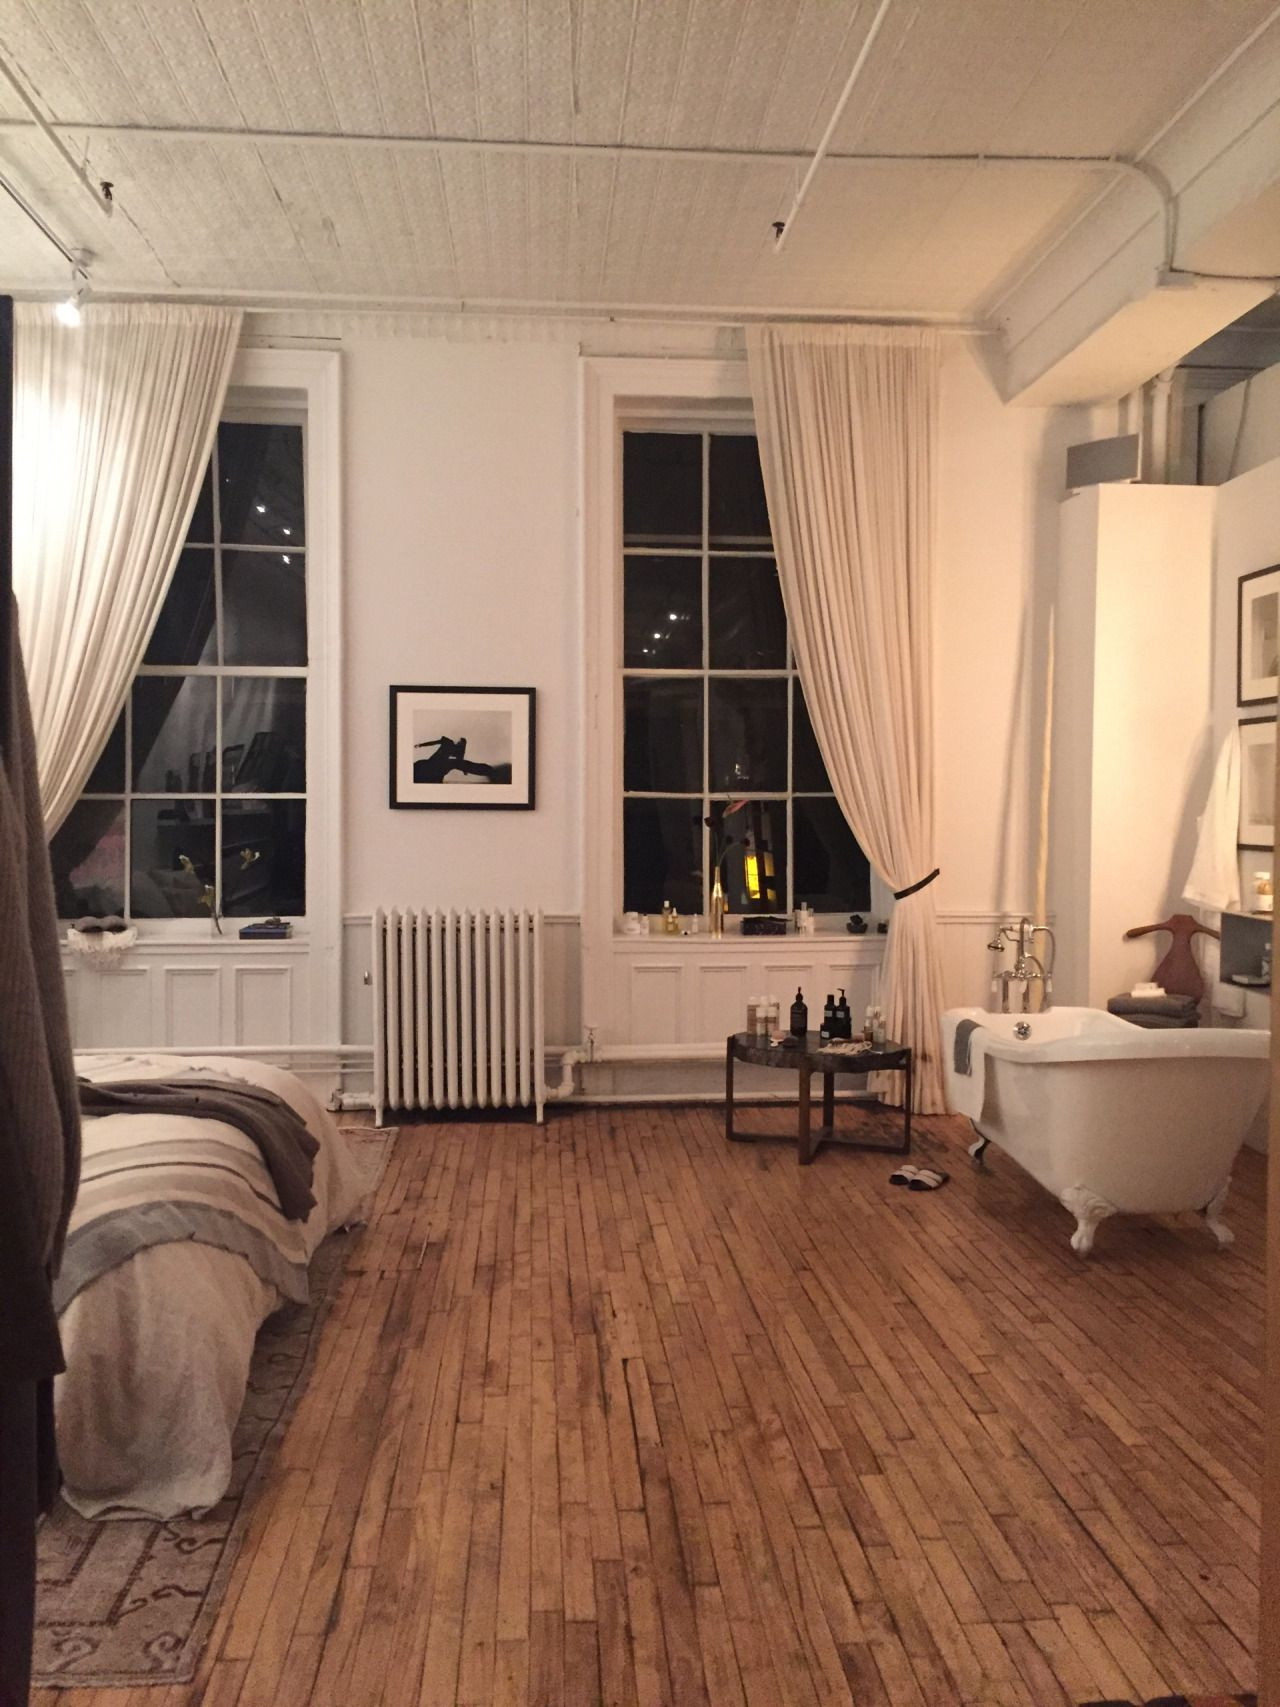 Loft space bedroom ideas  happyplanteater ucapartment goals tbh ud  Inspiration Wohnen